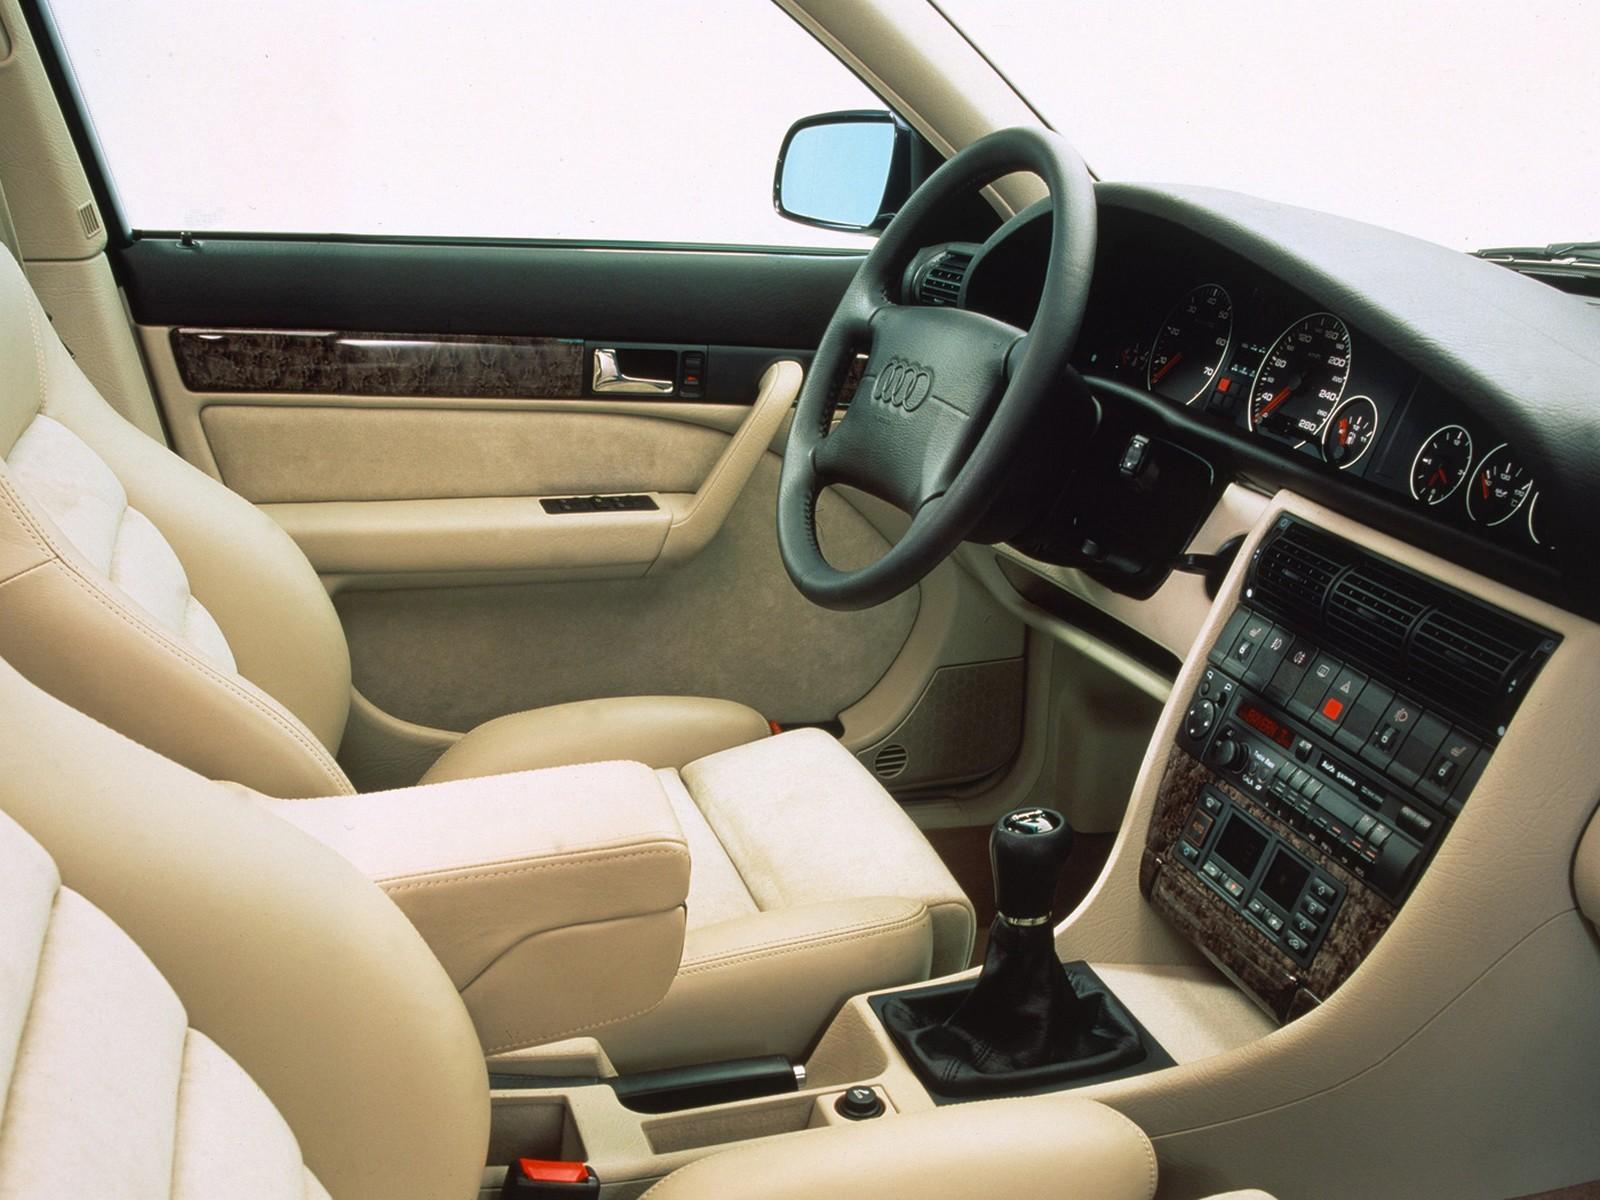 AUDI A6 (C4) specs - 1994, 1995, 1996, 1997 - autoevolution